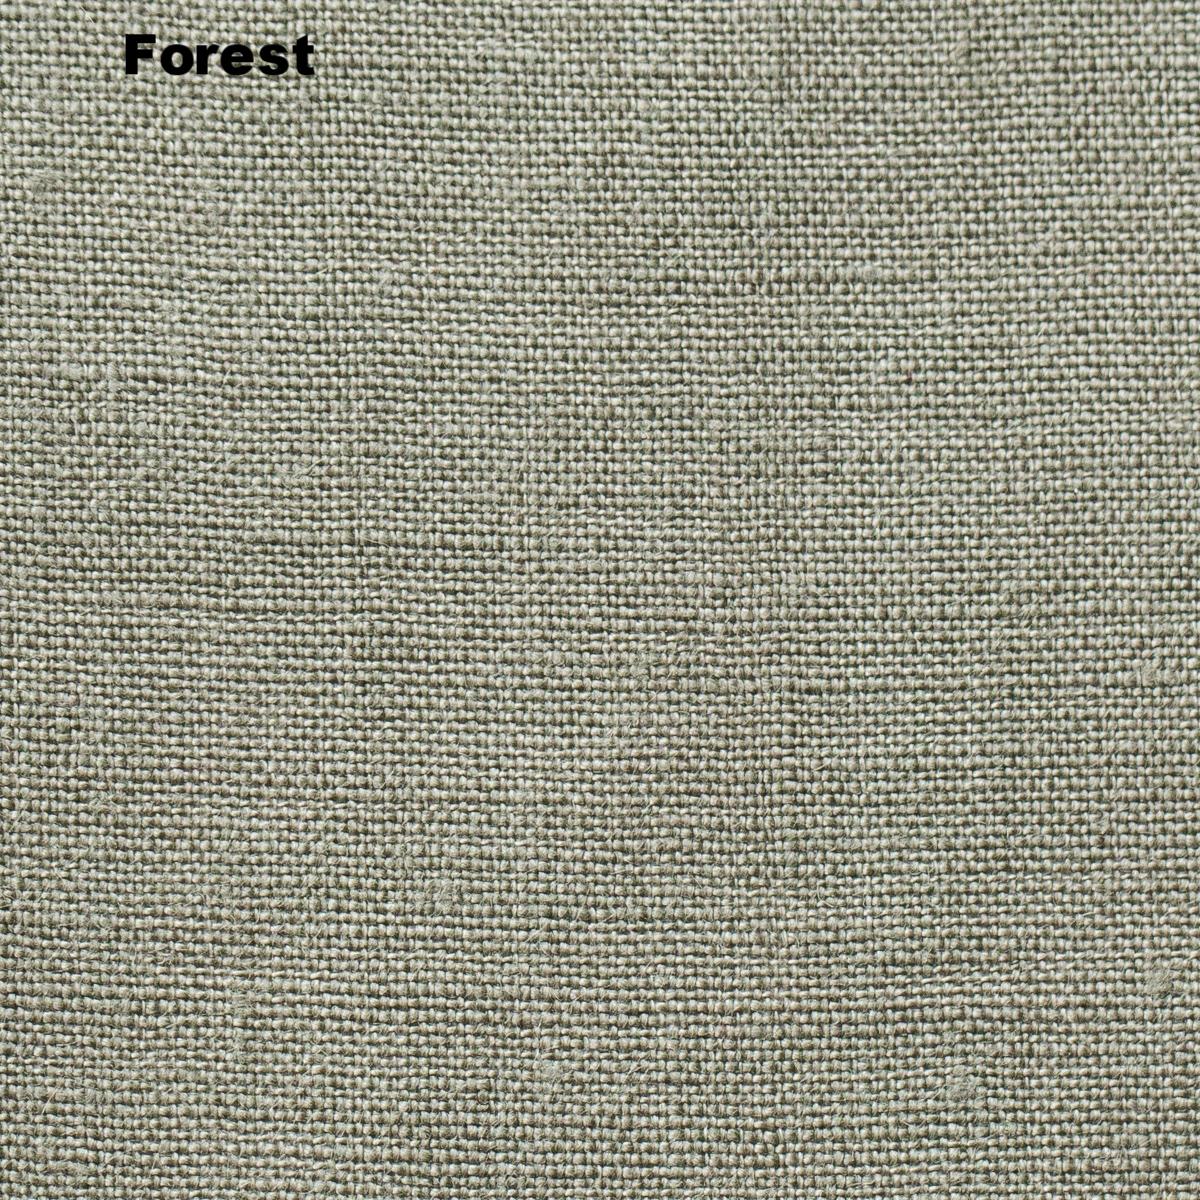 09_forest.jpg